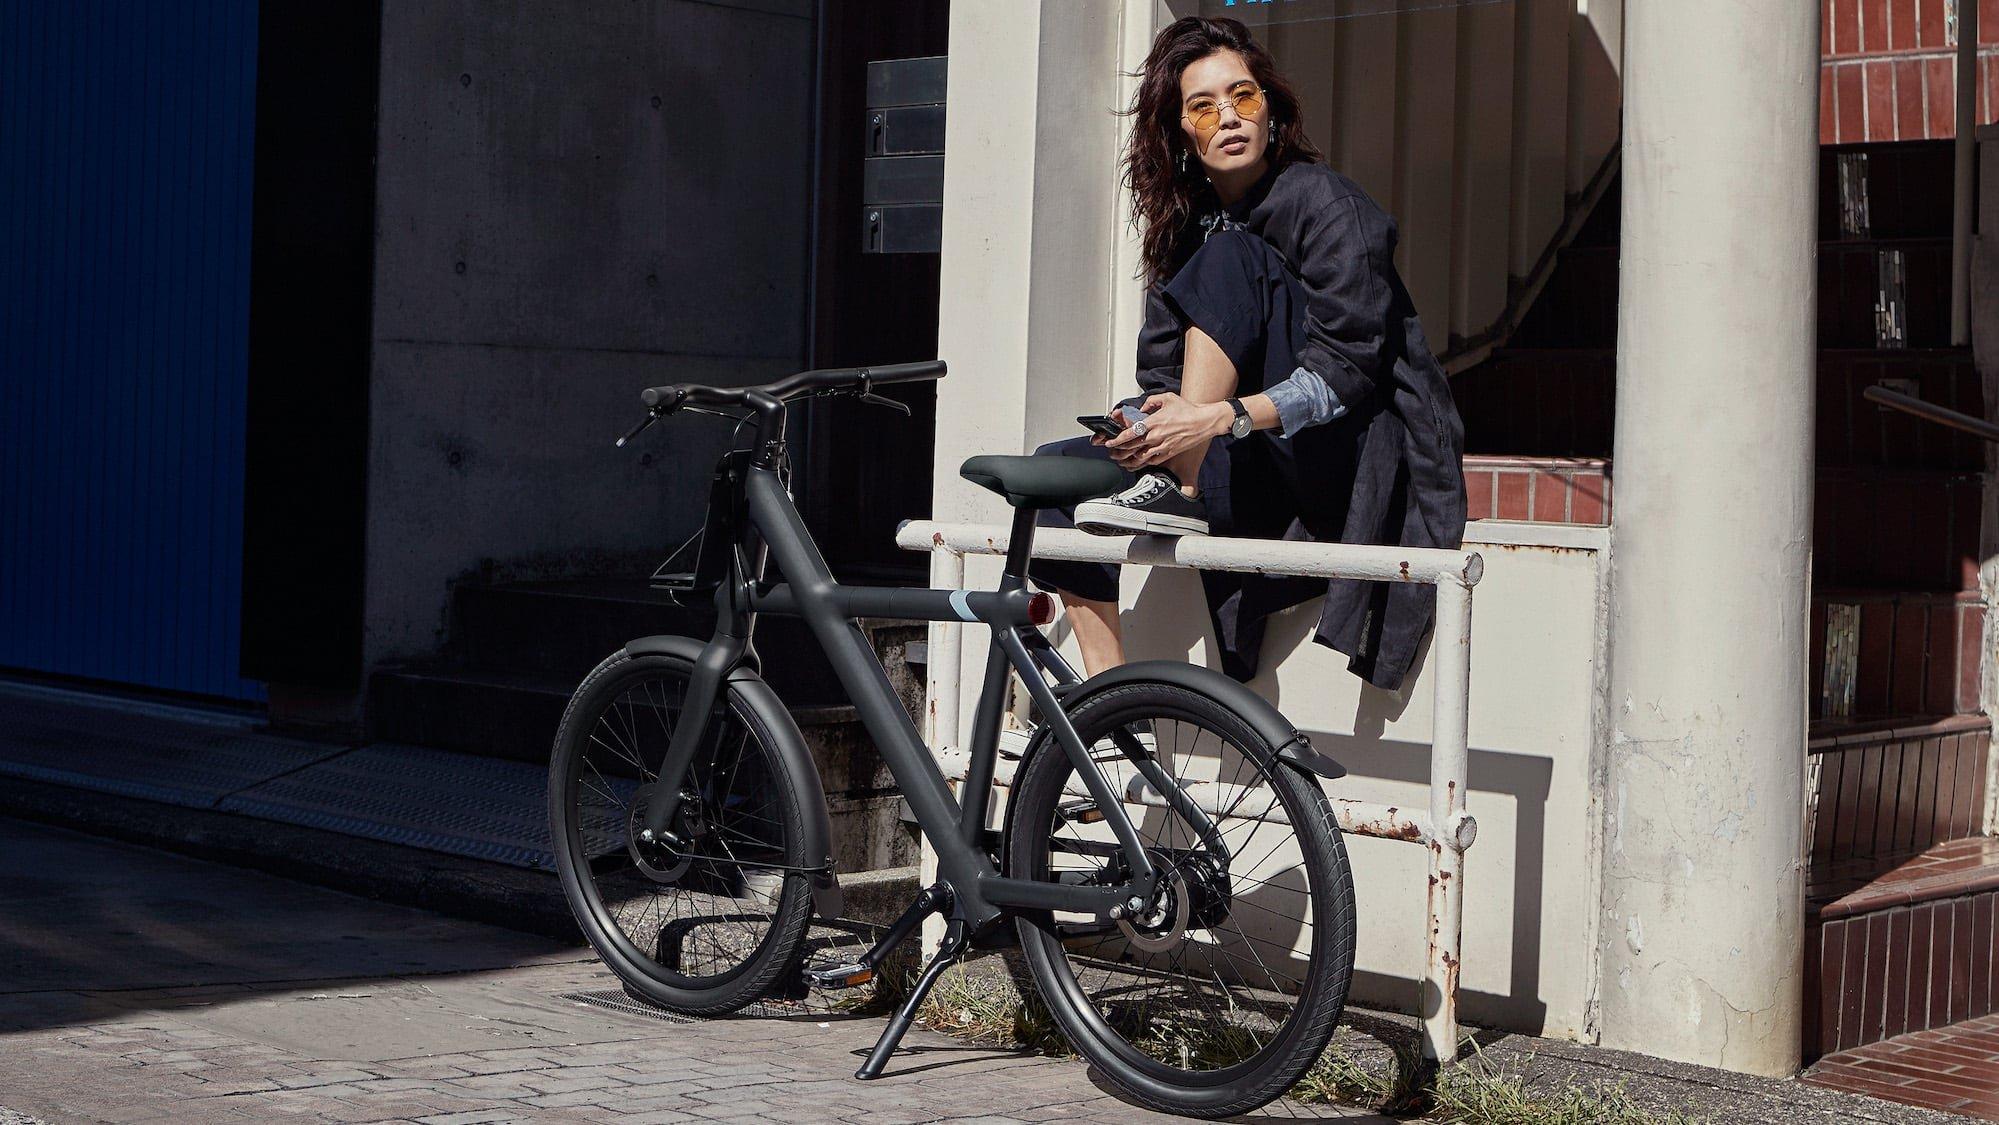 VanMoof X3 intelligent electric bike automatically shifts its gears